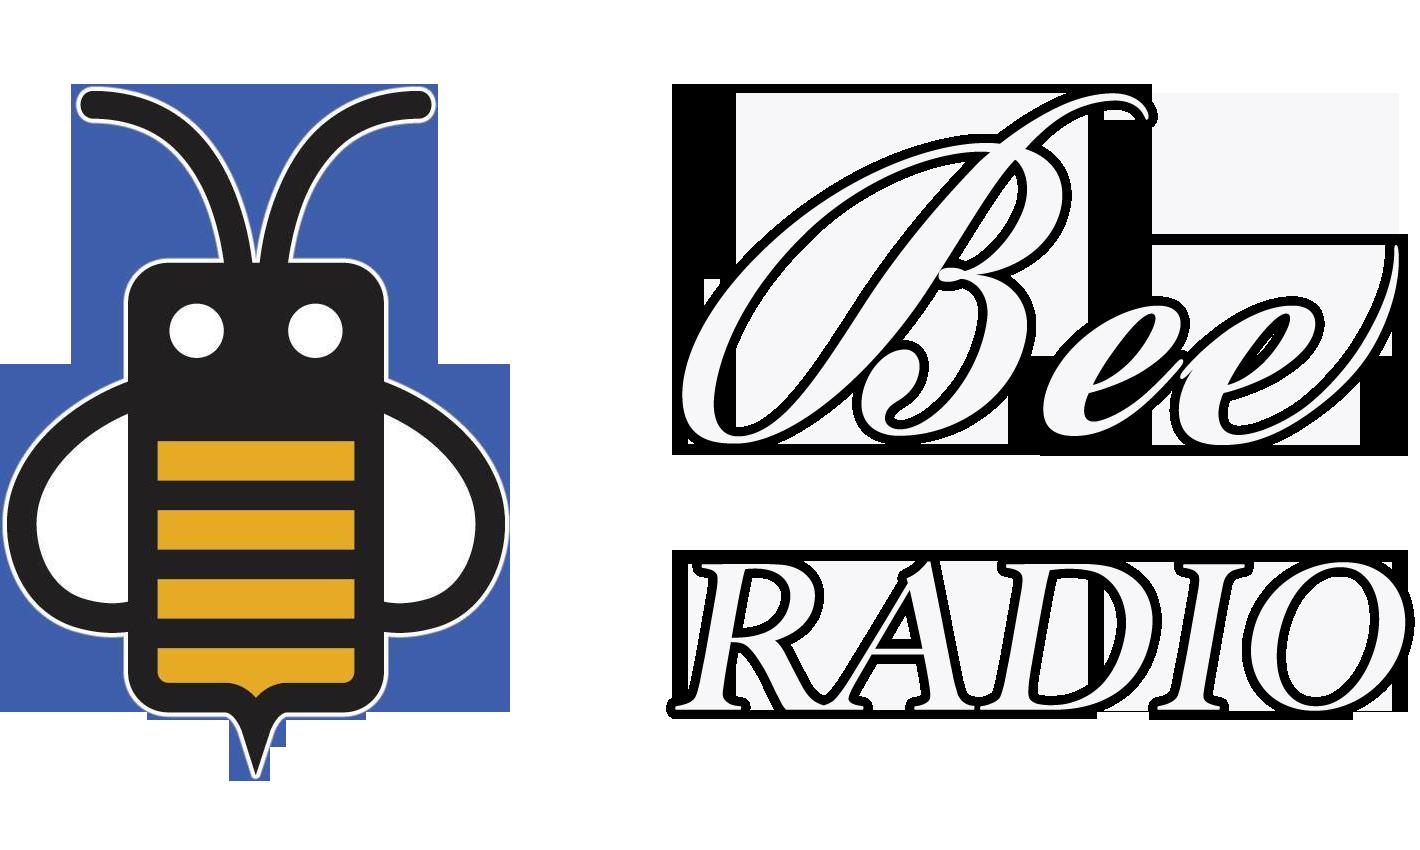 Bee Radio-Μουσική για  επαγγελματικούς χώρους επιχειρήσεις μαγαζιά